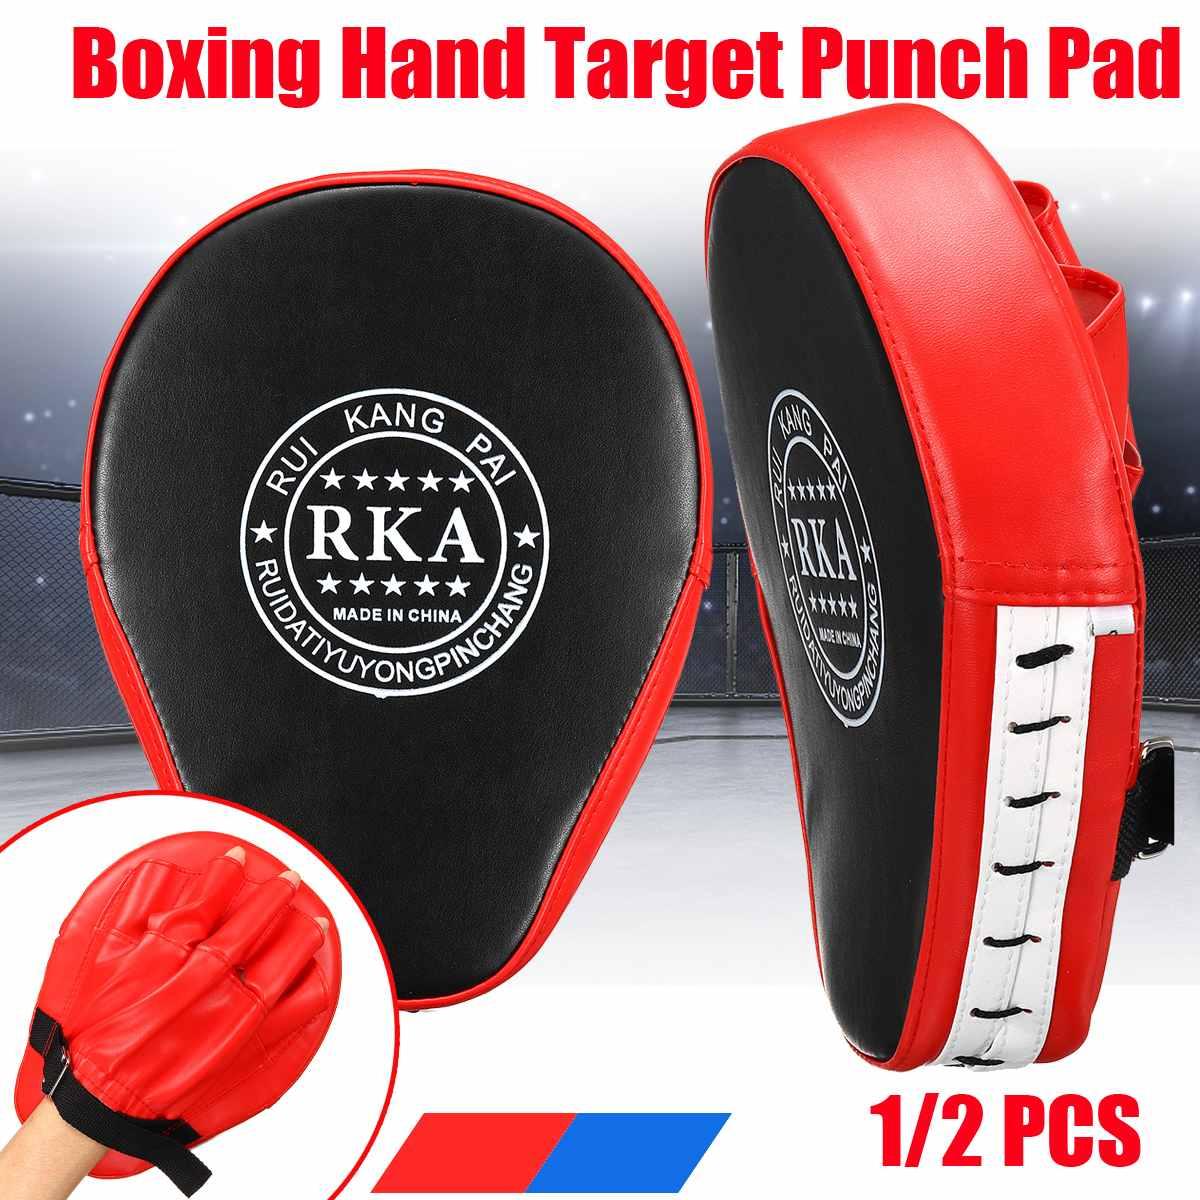 2PCS Boxsack Boxen Pad Sand Tasche Fitness Taekwondo MMA Hand Treten Pad PU Leder Ausbildung Getriebe Muay Thai fuß Ziel